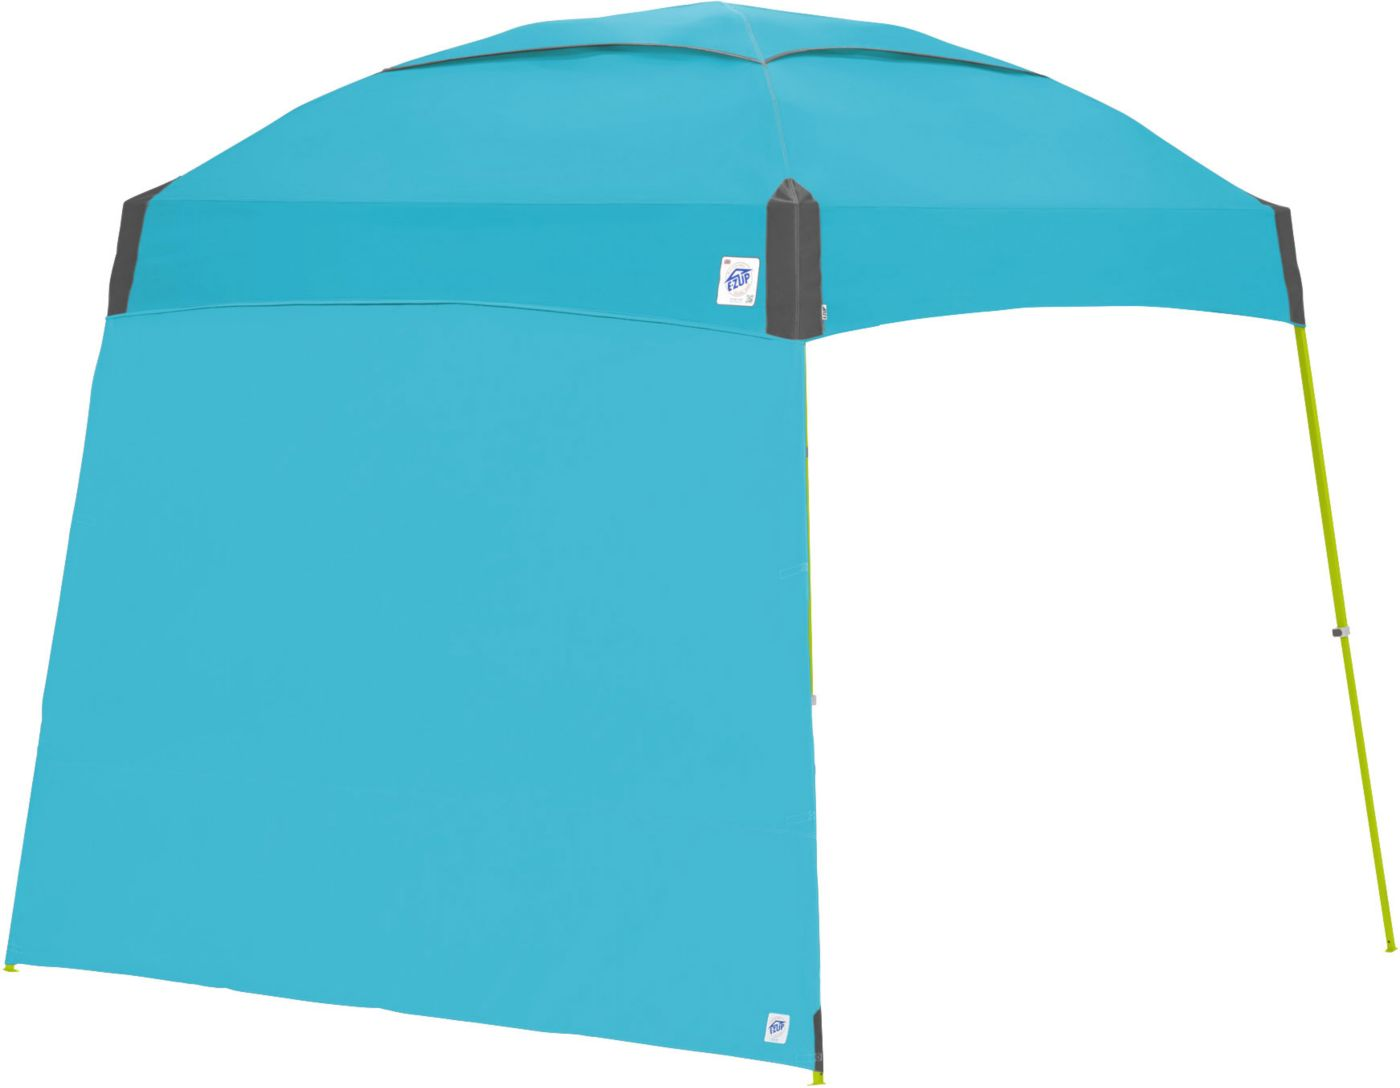 E-Z UP 10' Angle Leg Instant Sidewall